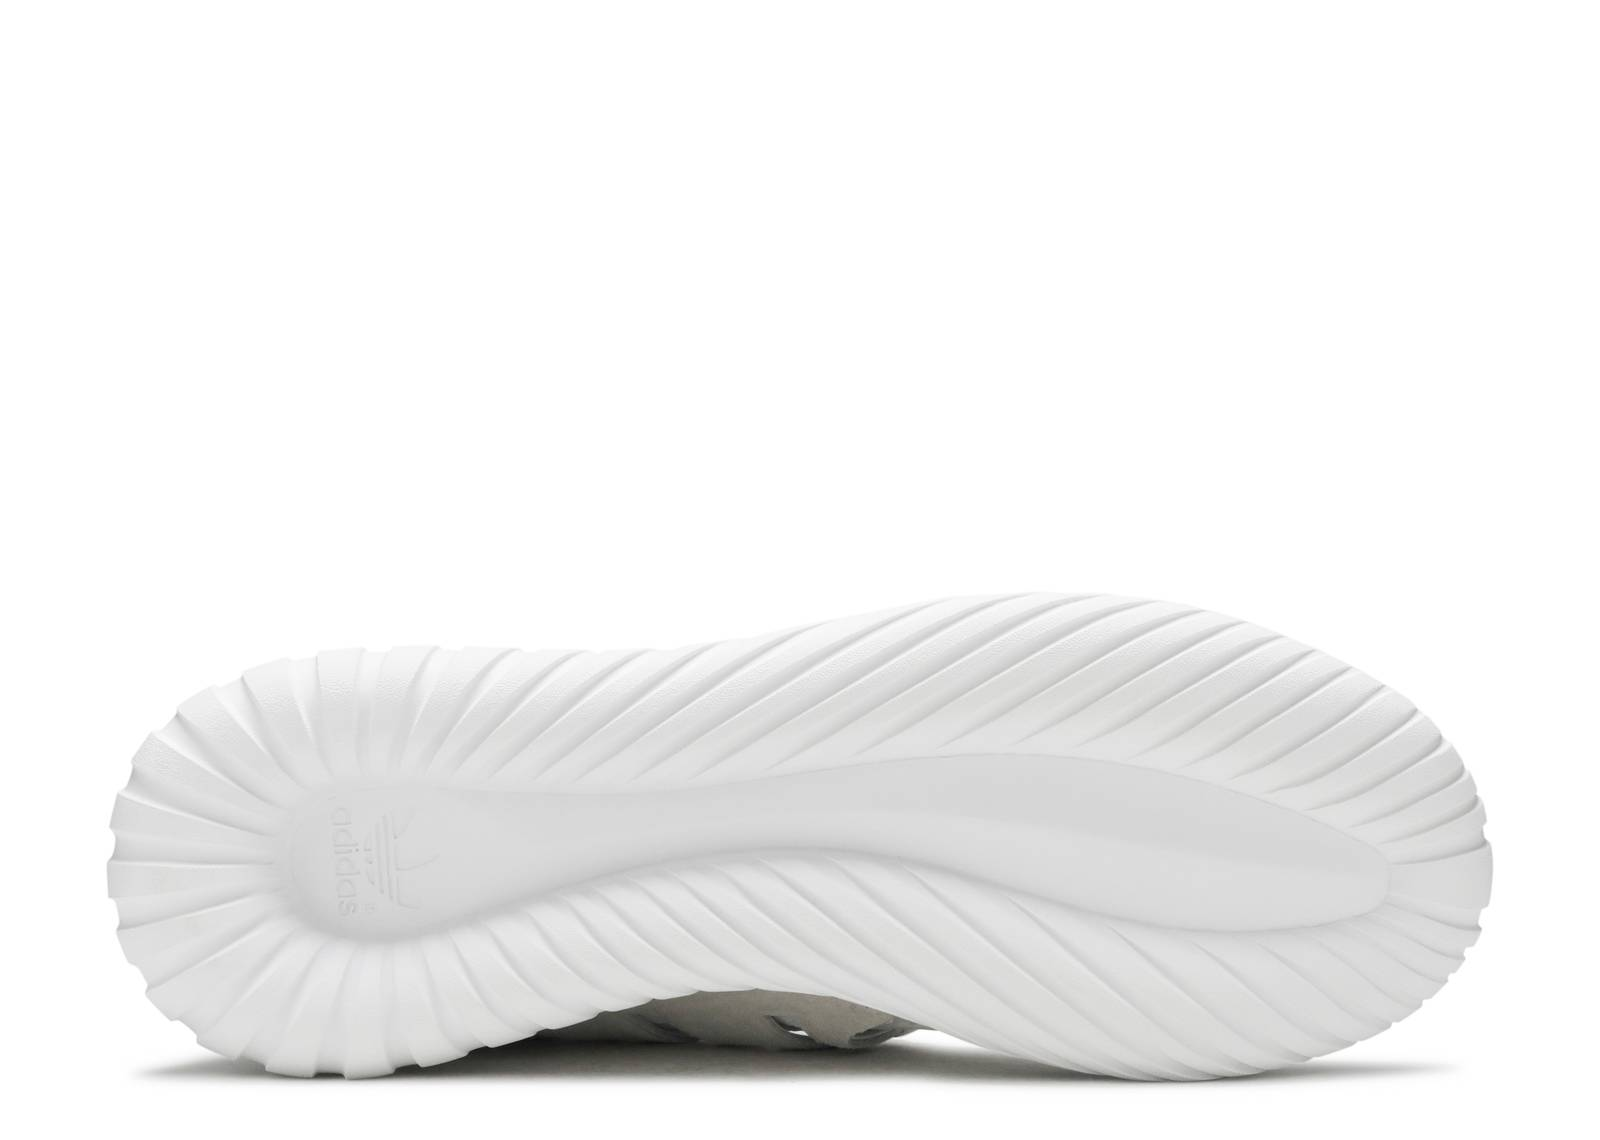 uk availability f1cbe c25e6 63611743073-adidas-tubular-nova-pk-ftwrwhite-vintagwht-201358 4.jpg